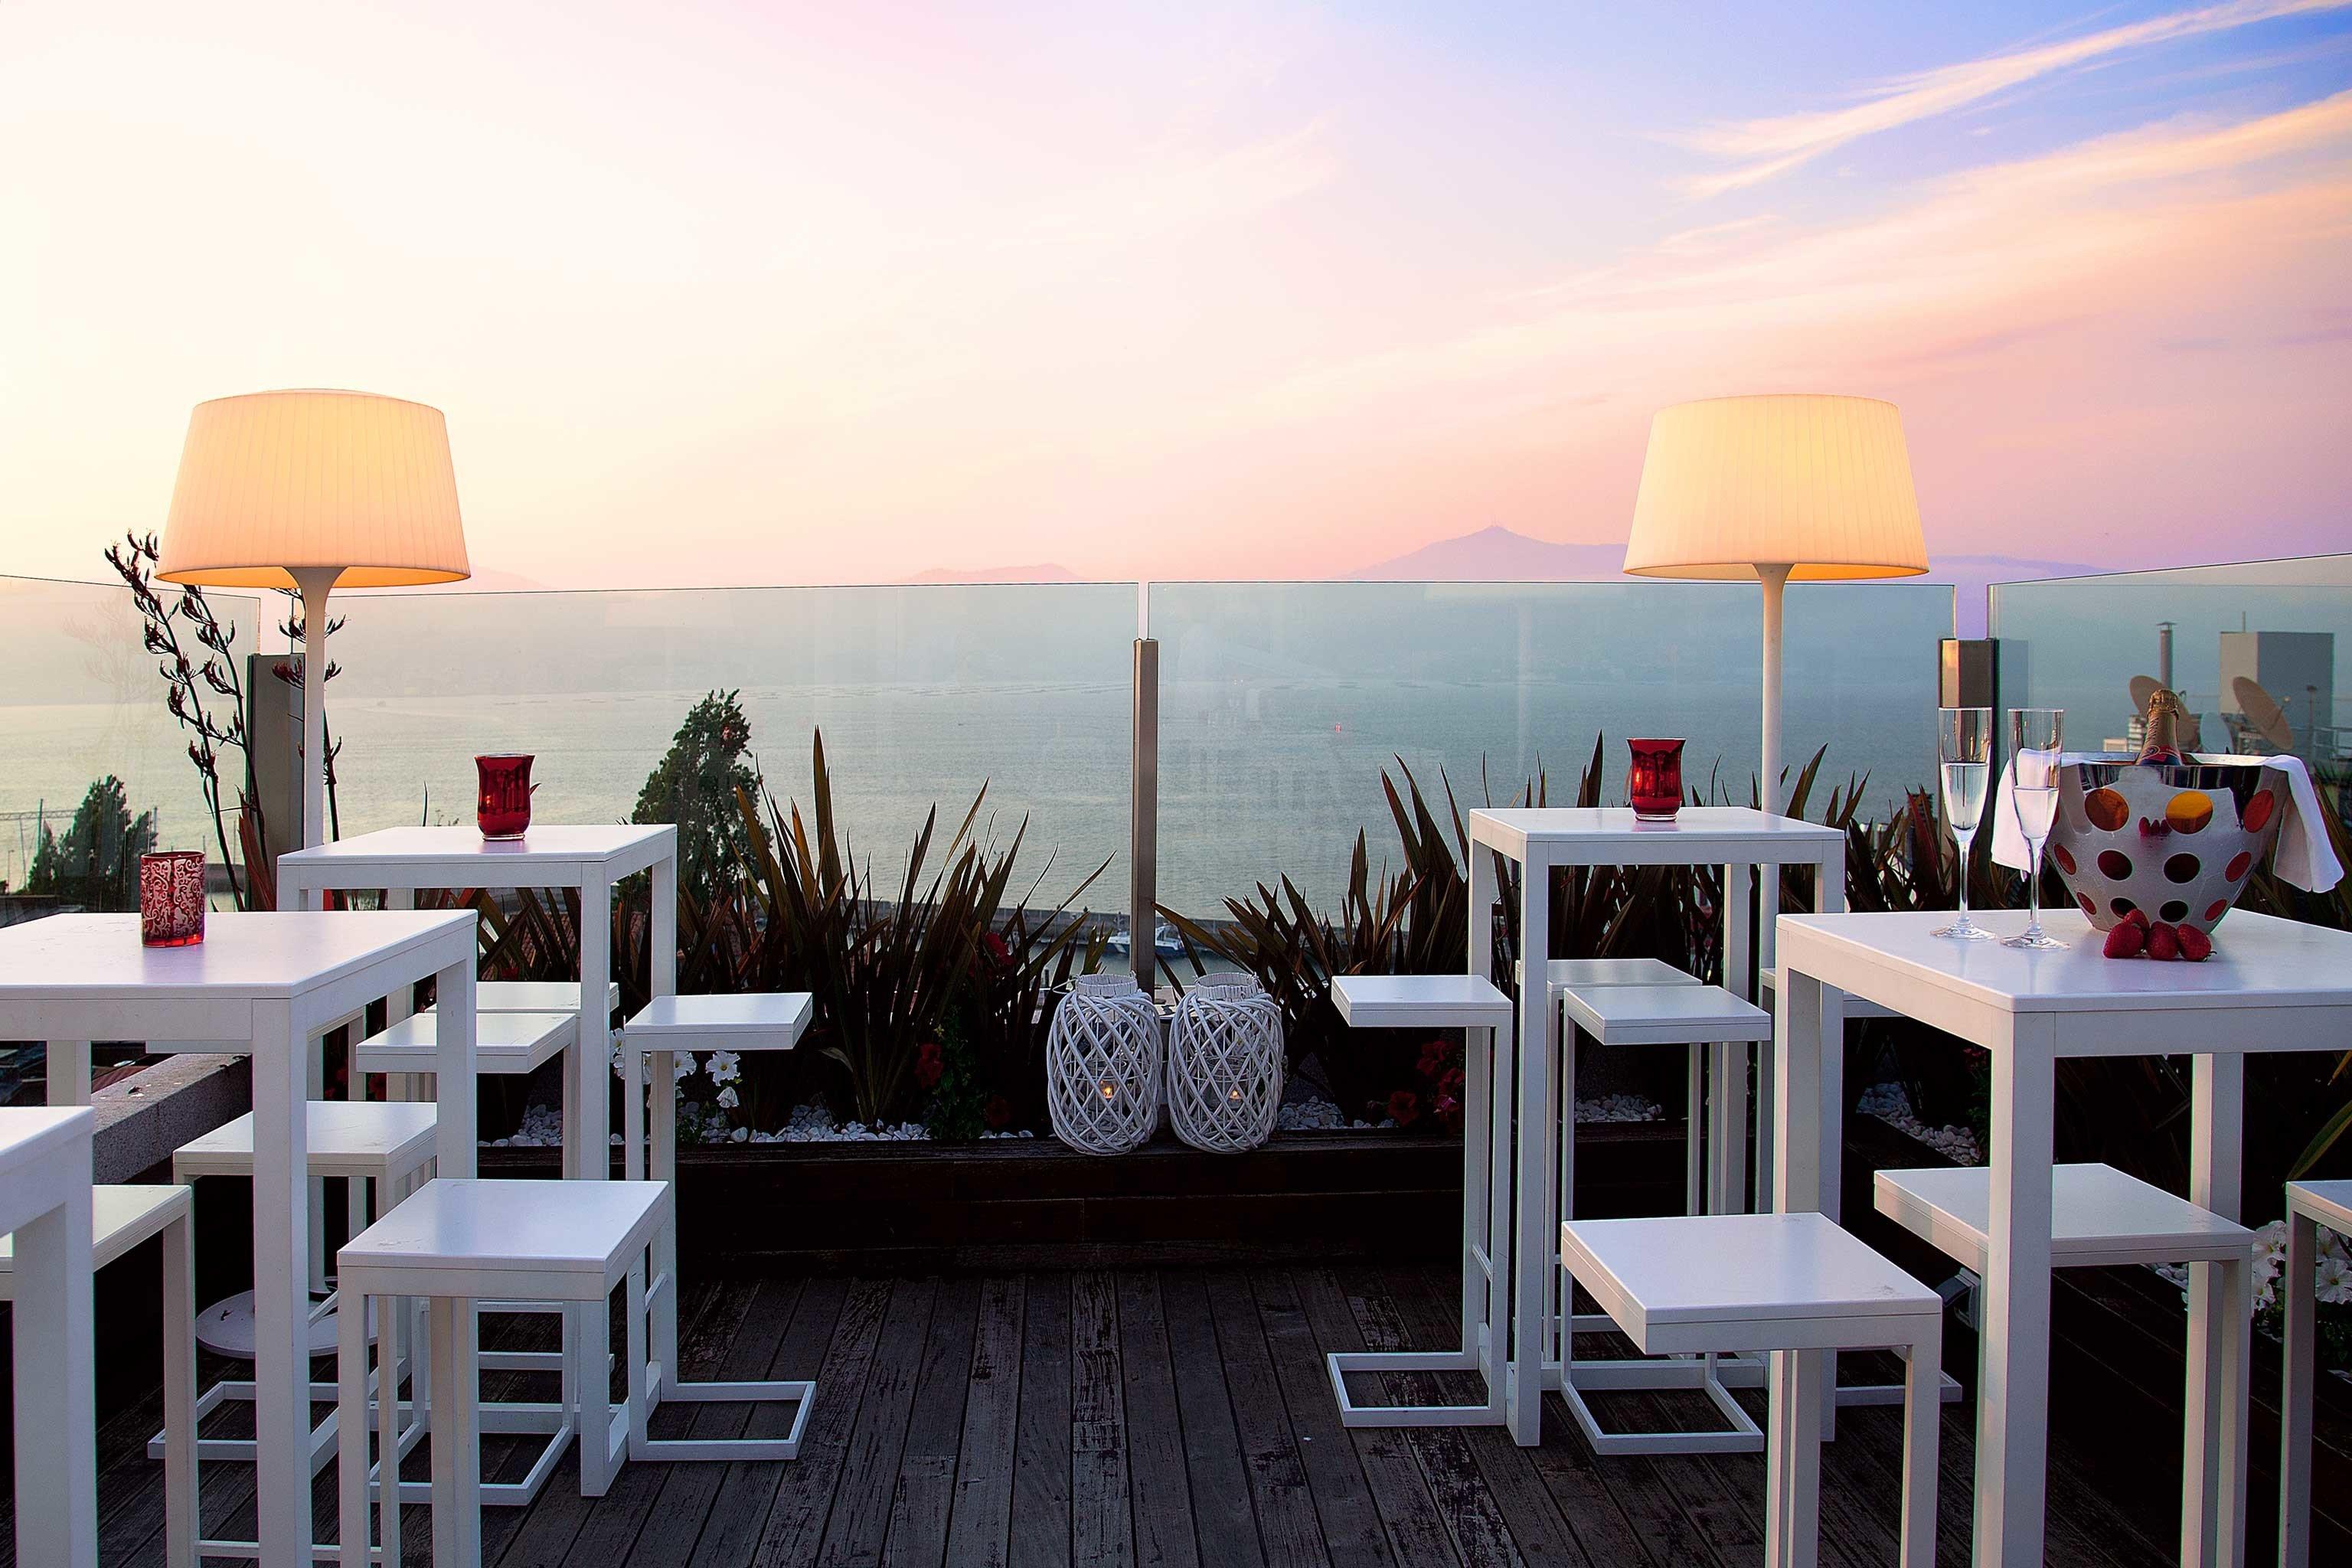 Bar Beachfront Dining Drink Eat Lounge Luxury sky chair restaurant set dining table